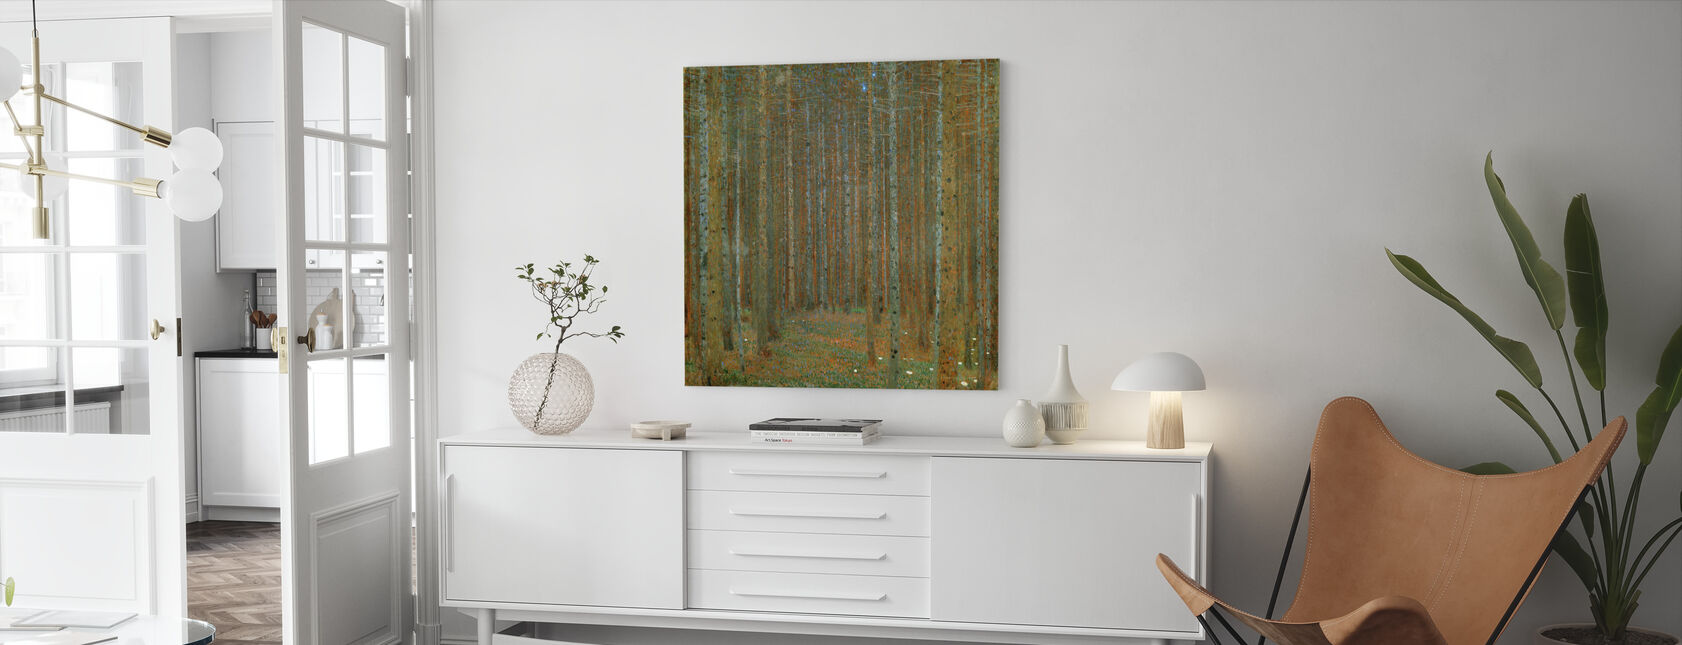 Klimt, Gustav - Fir Forest I - Canvas print - Living Room